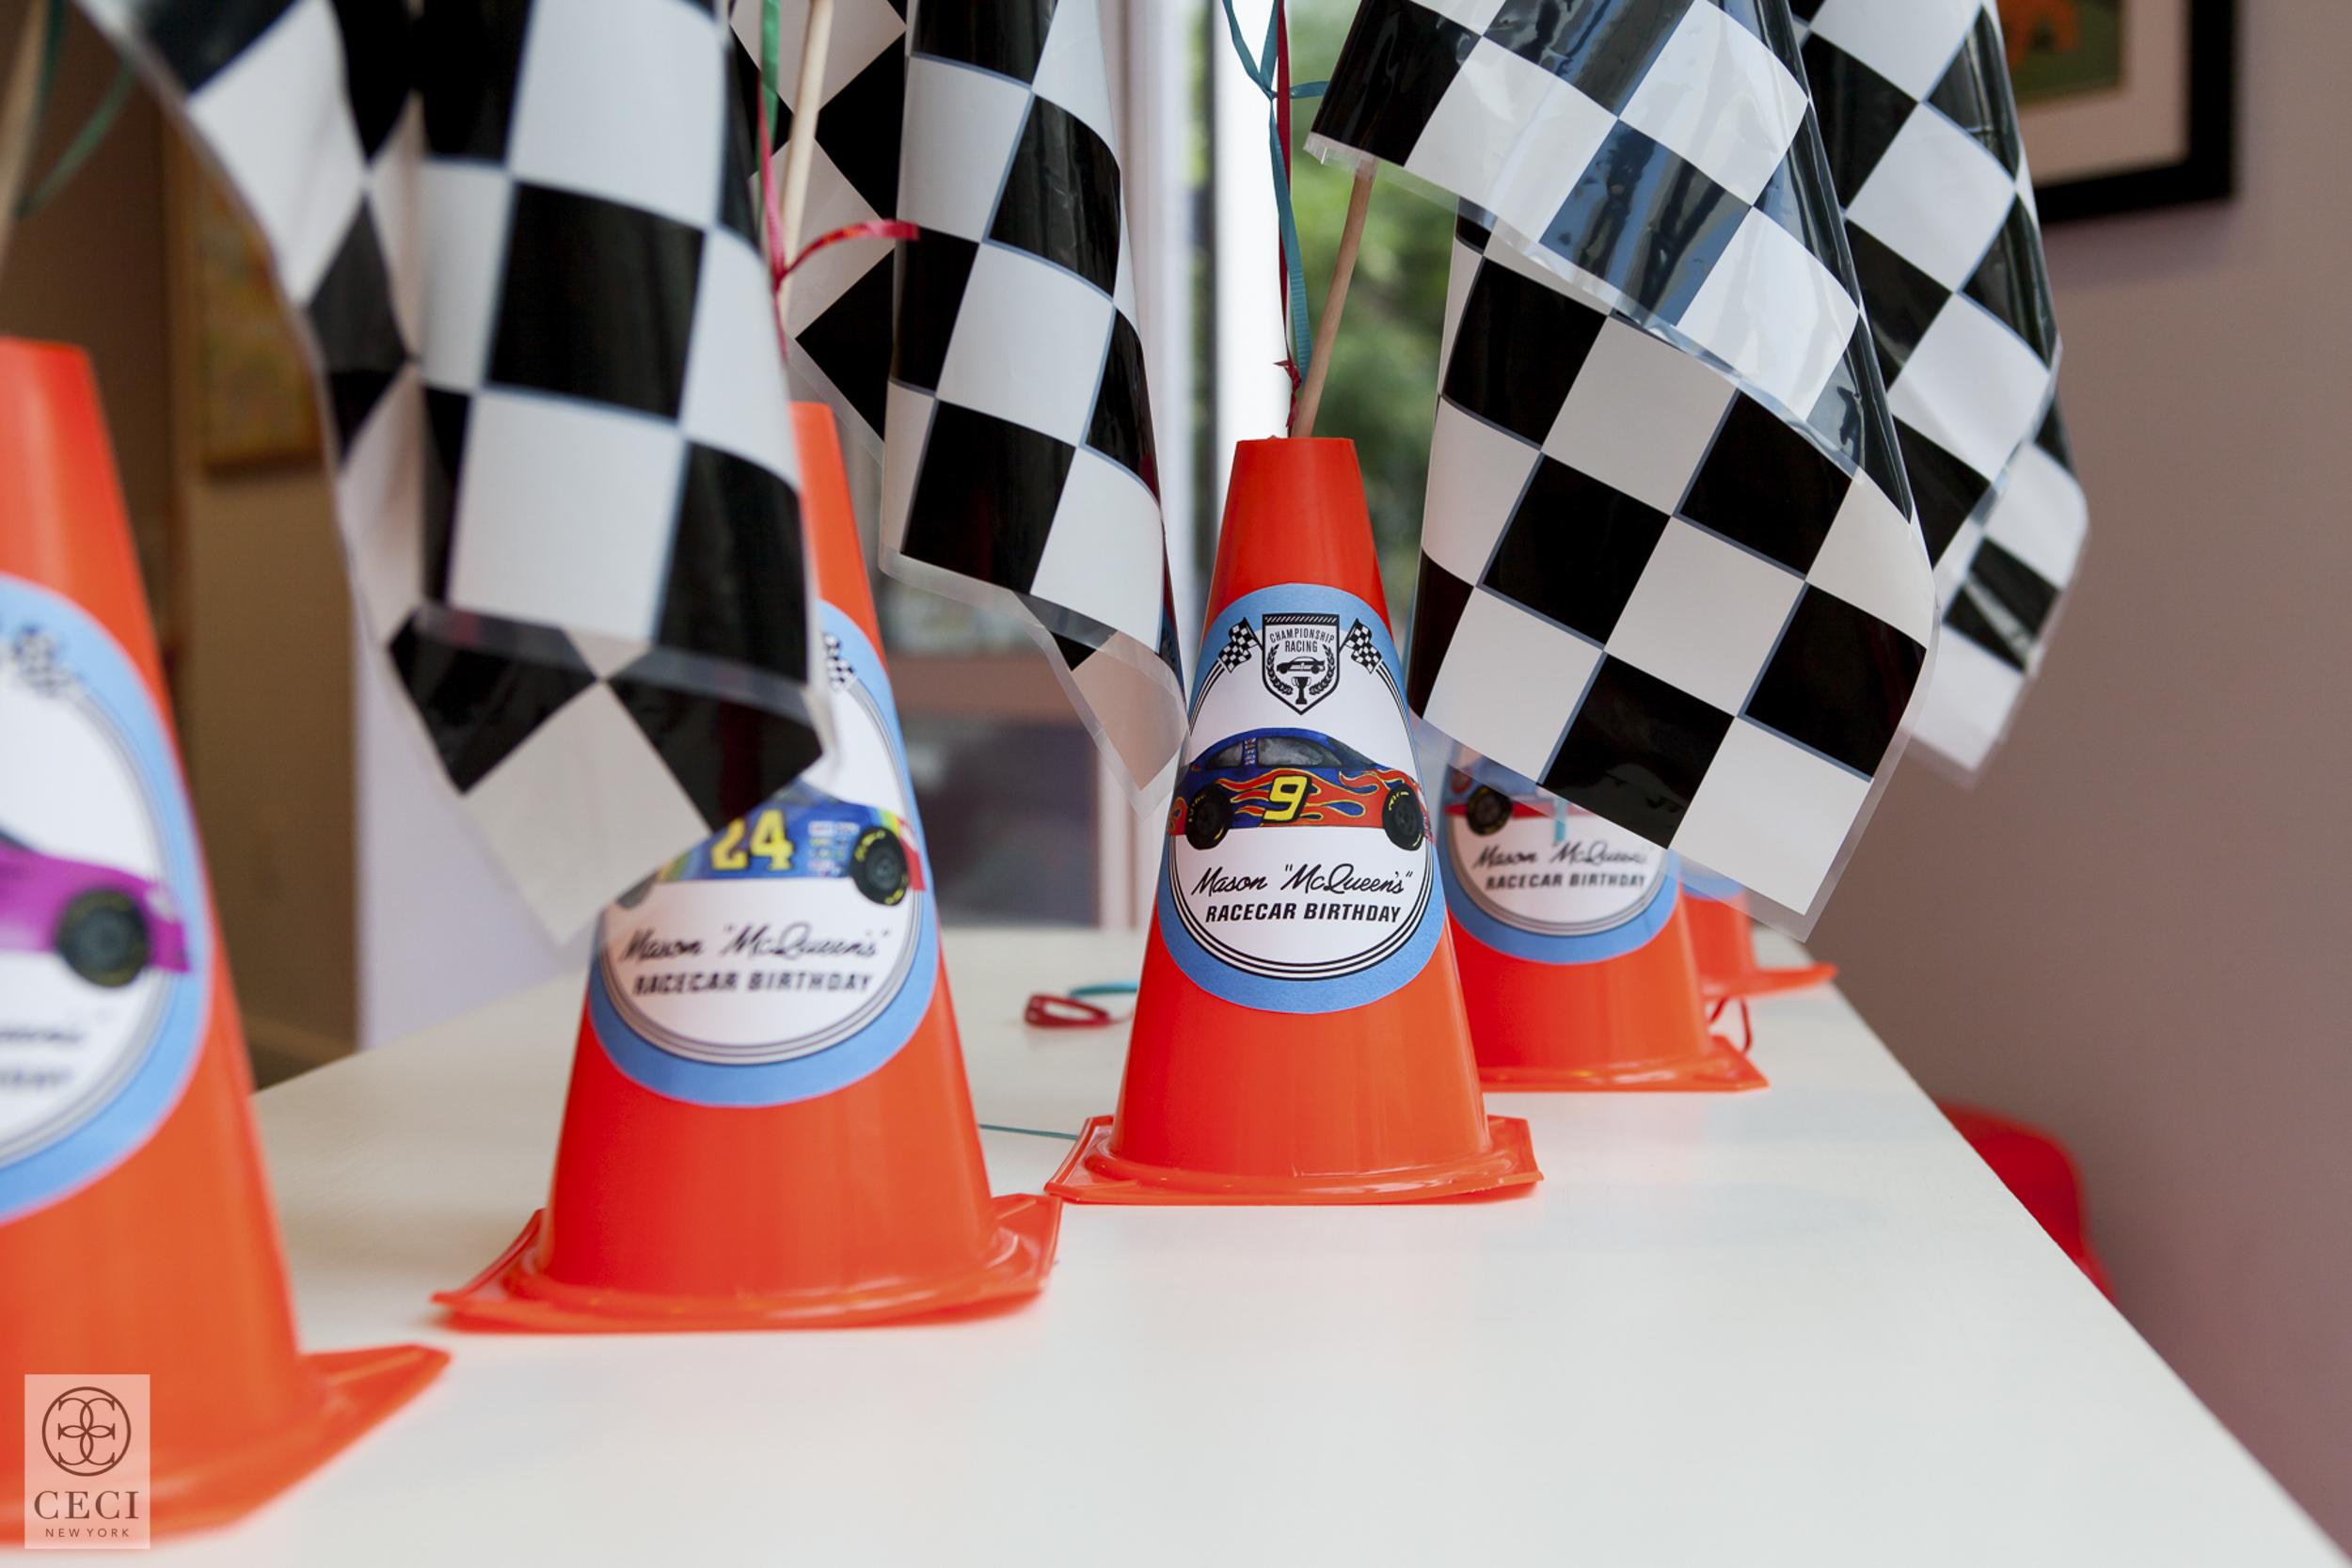 ceci_new_york_mason_ceci_johnson_race_car_birthday_party-9.jpg